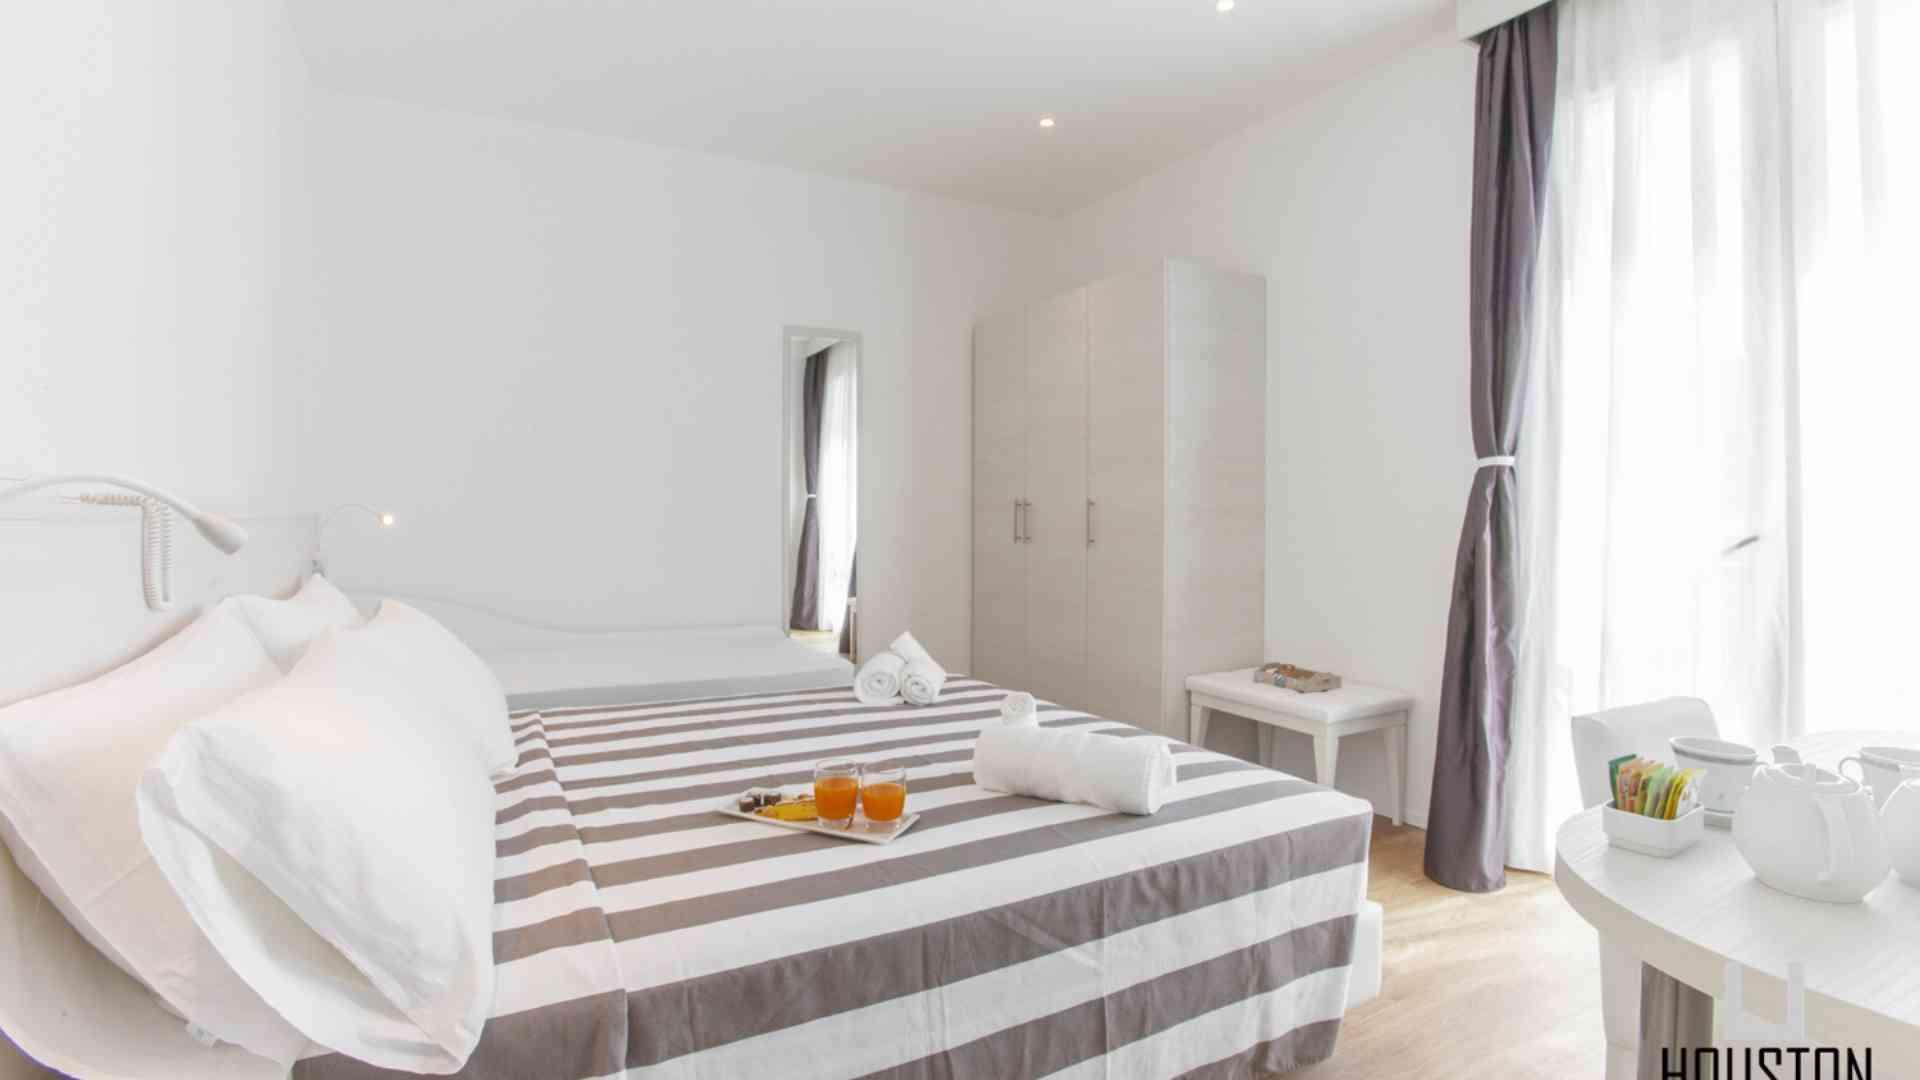 EVIDENZA_Camera_Houtson Hotel